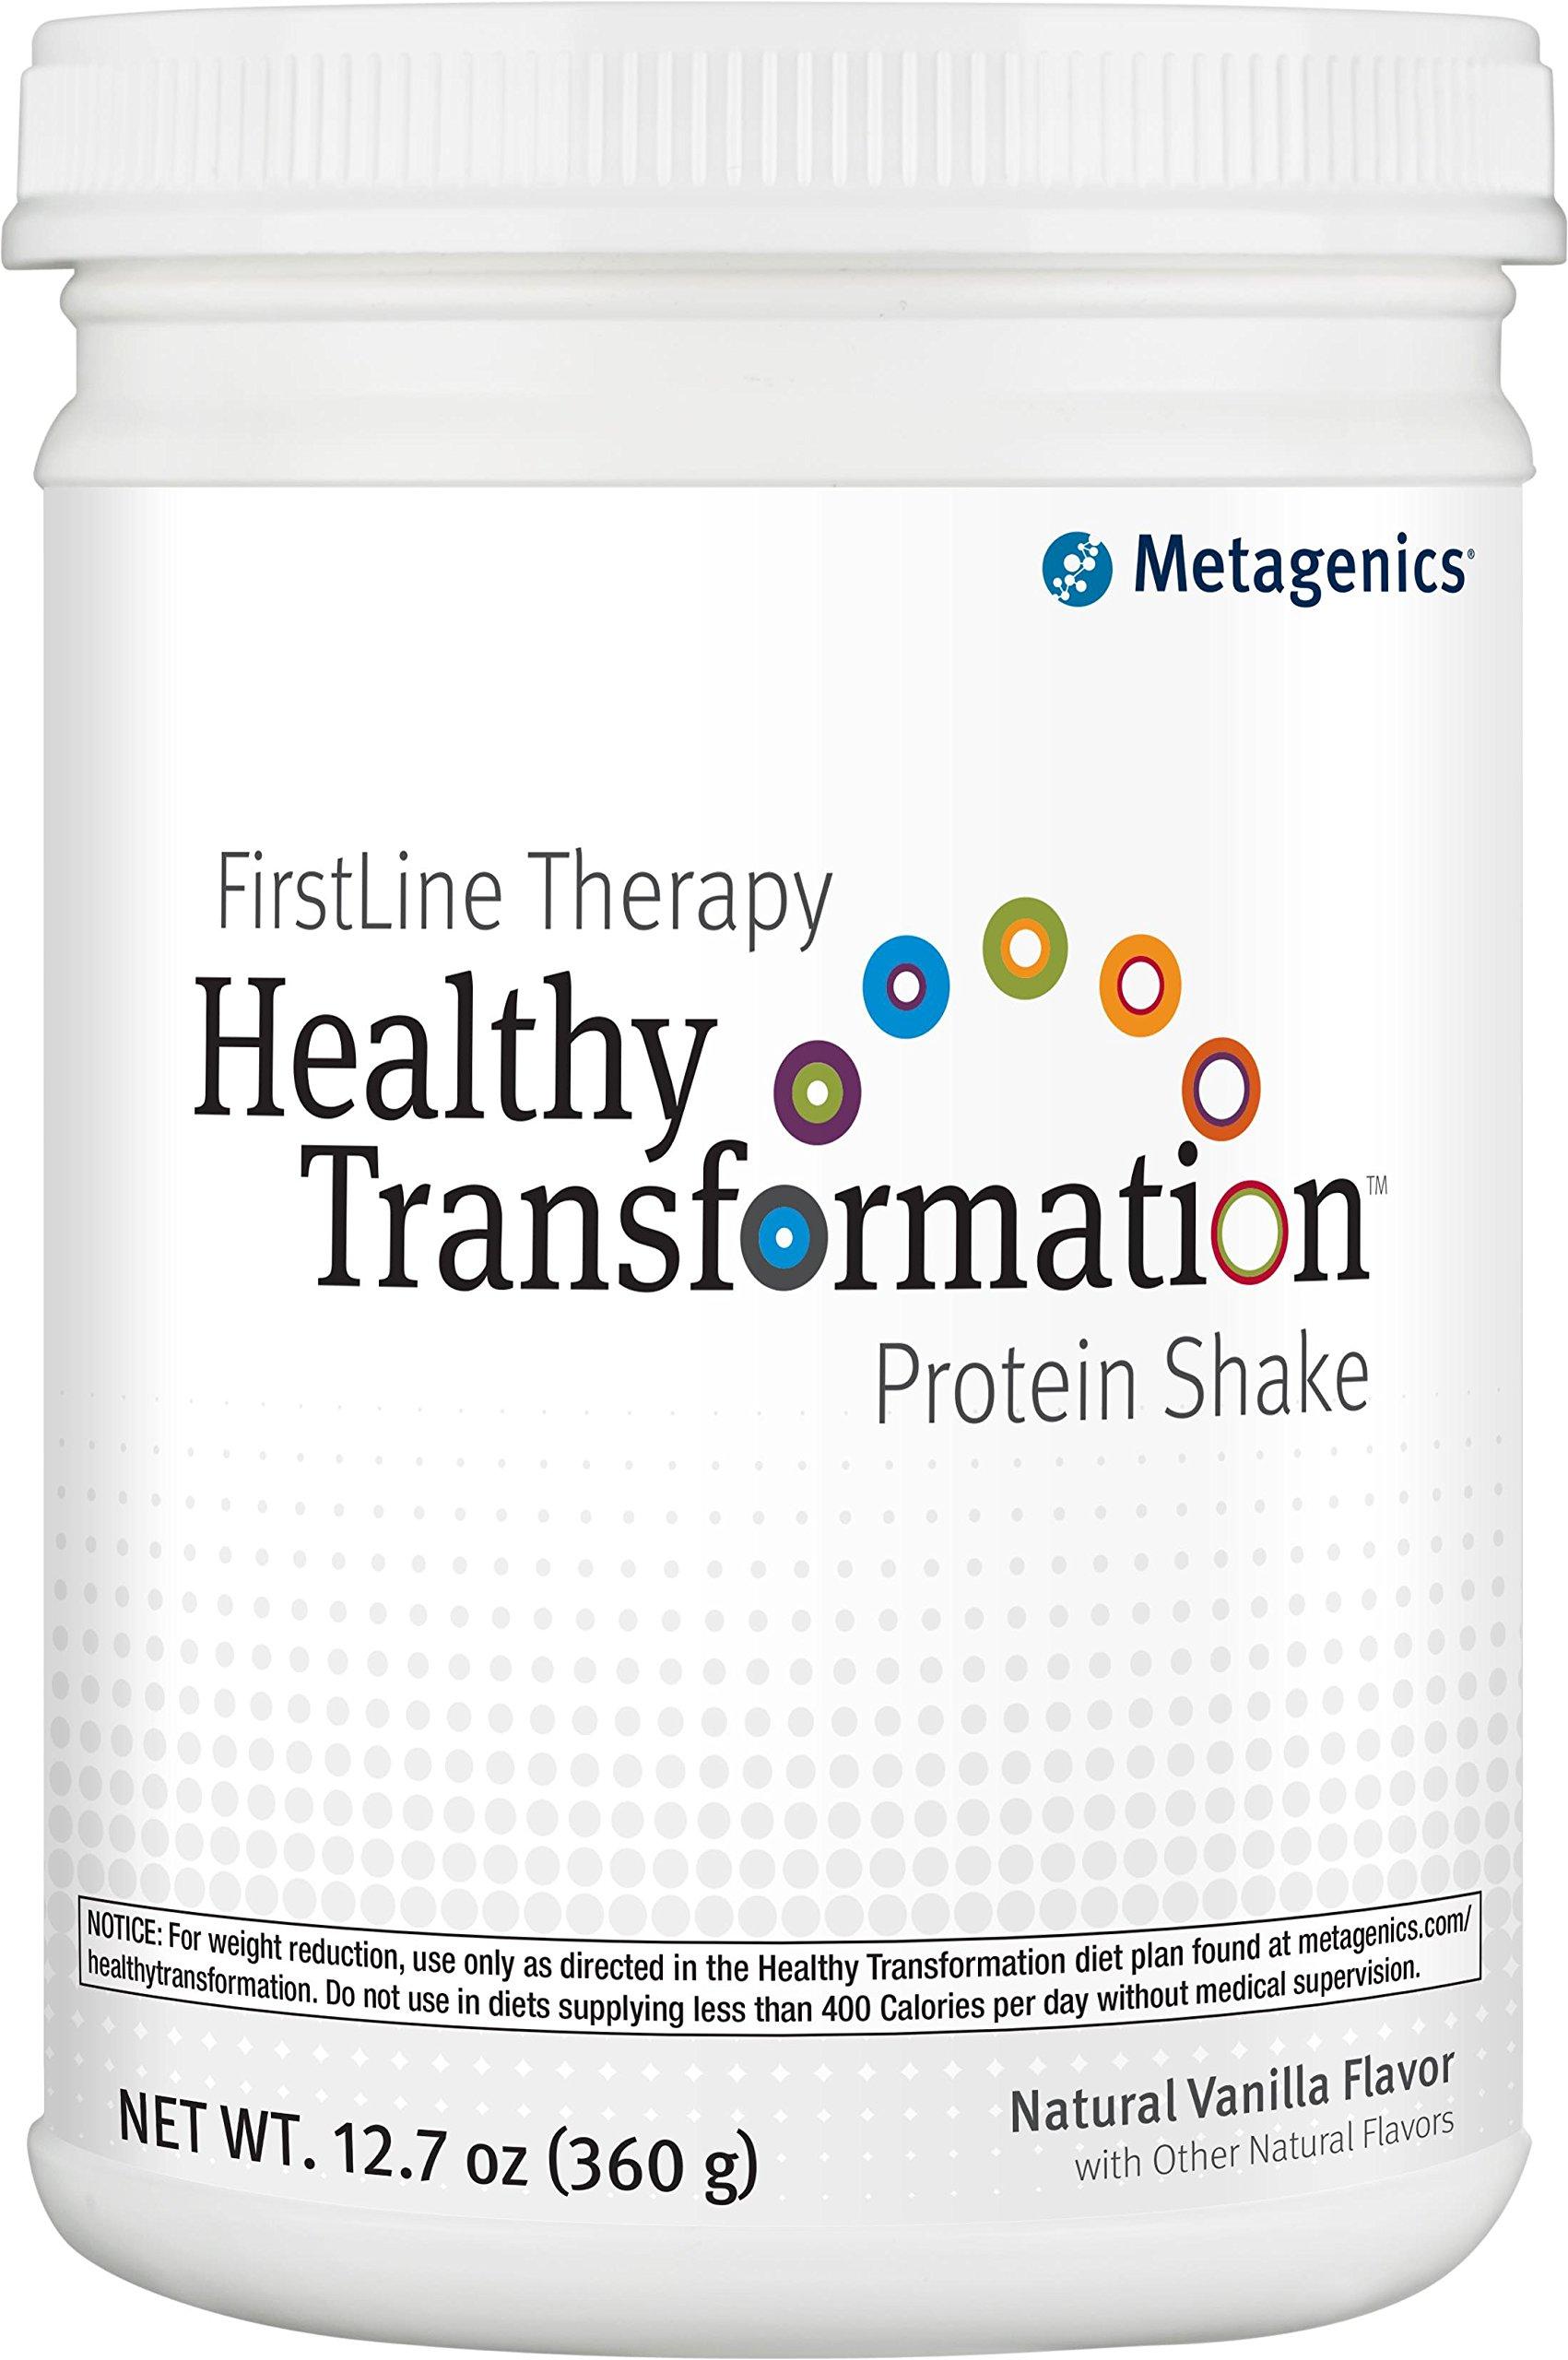 Metagenics - Healthy Transformation Protein Shake, Vanilla Flavor, 12.7 oz Powder